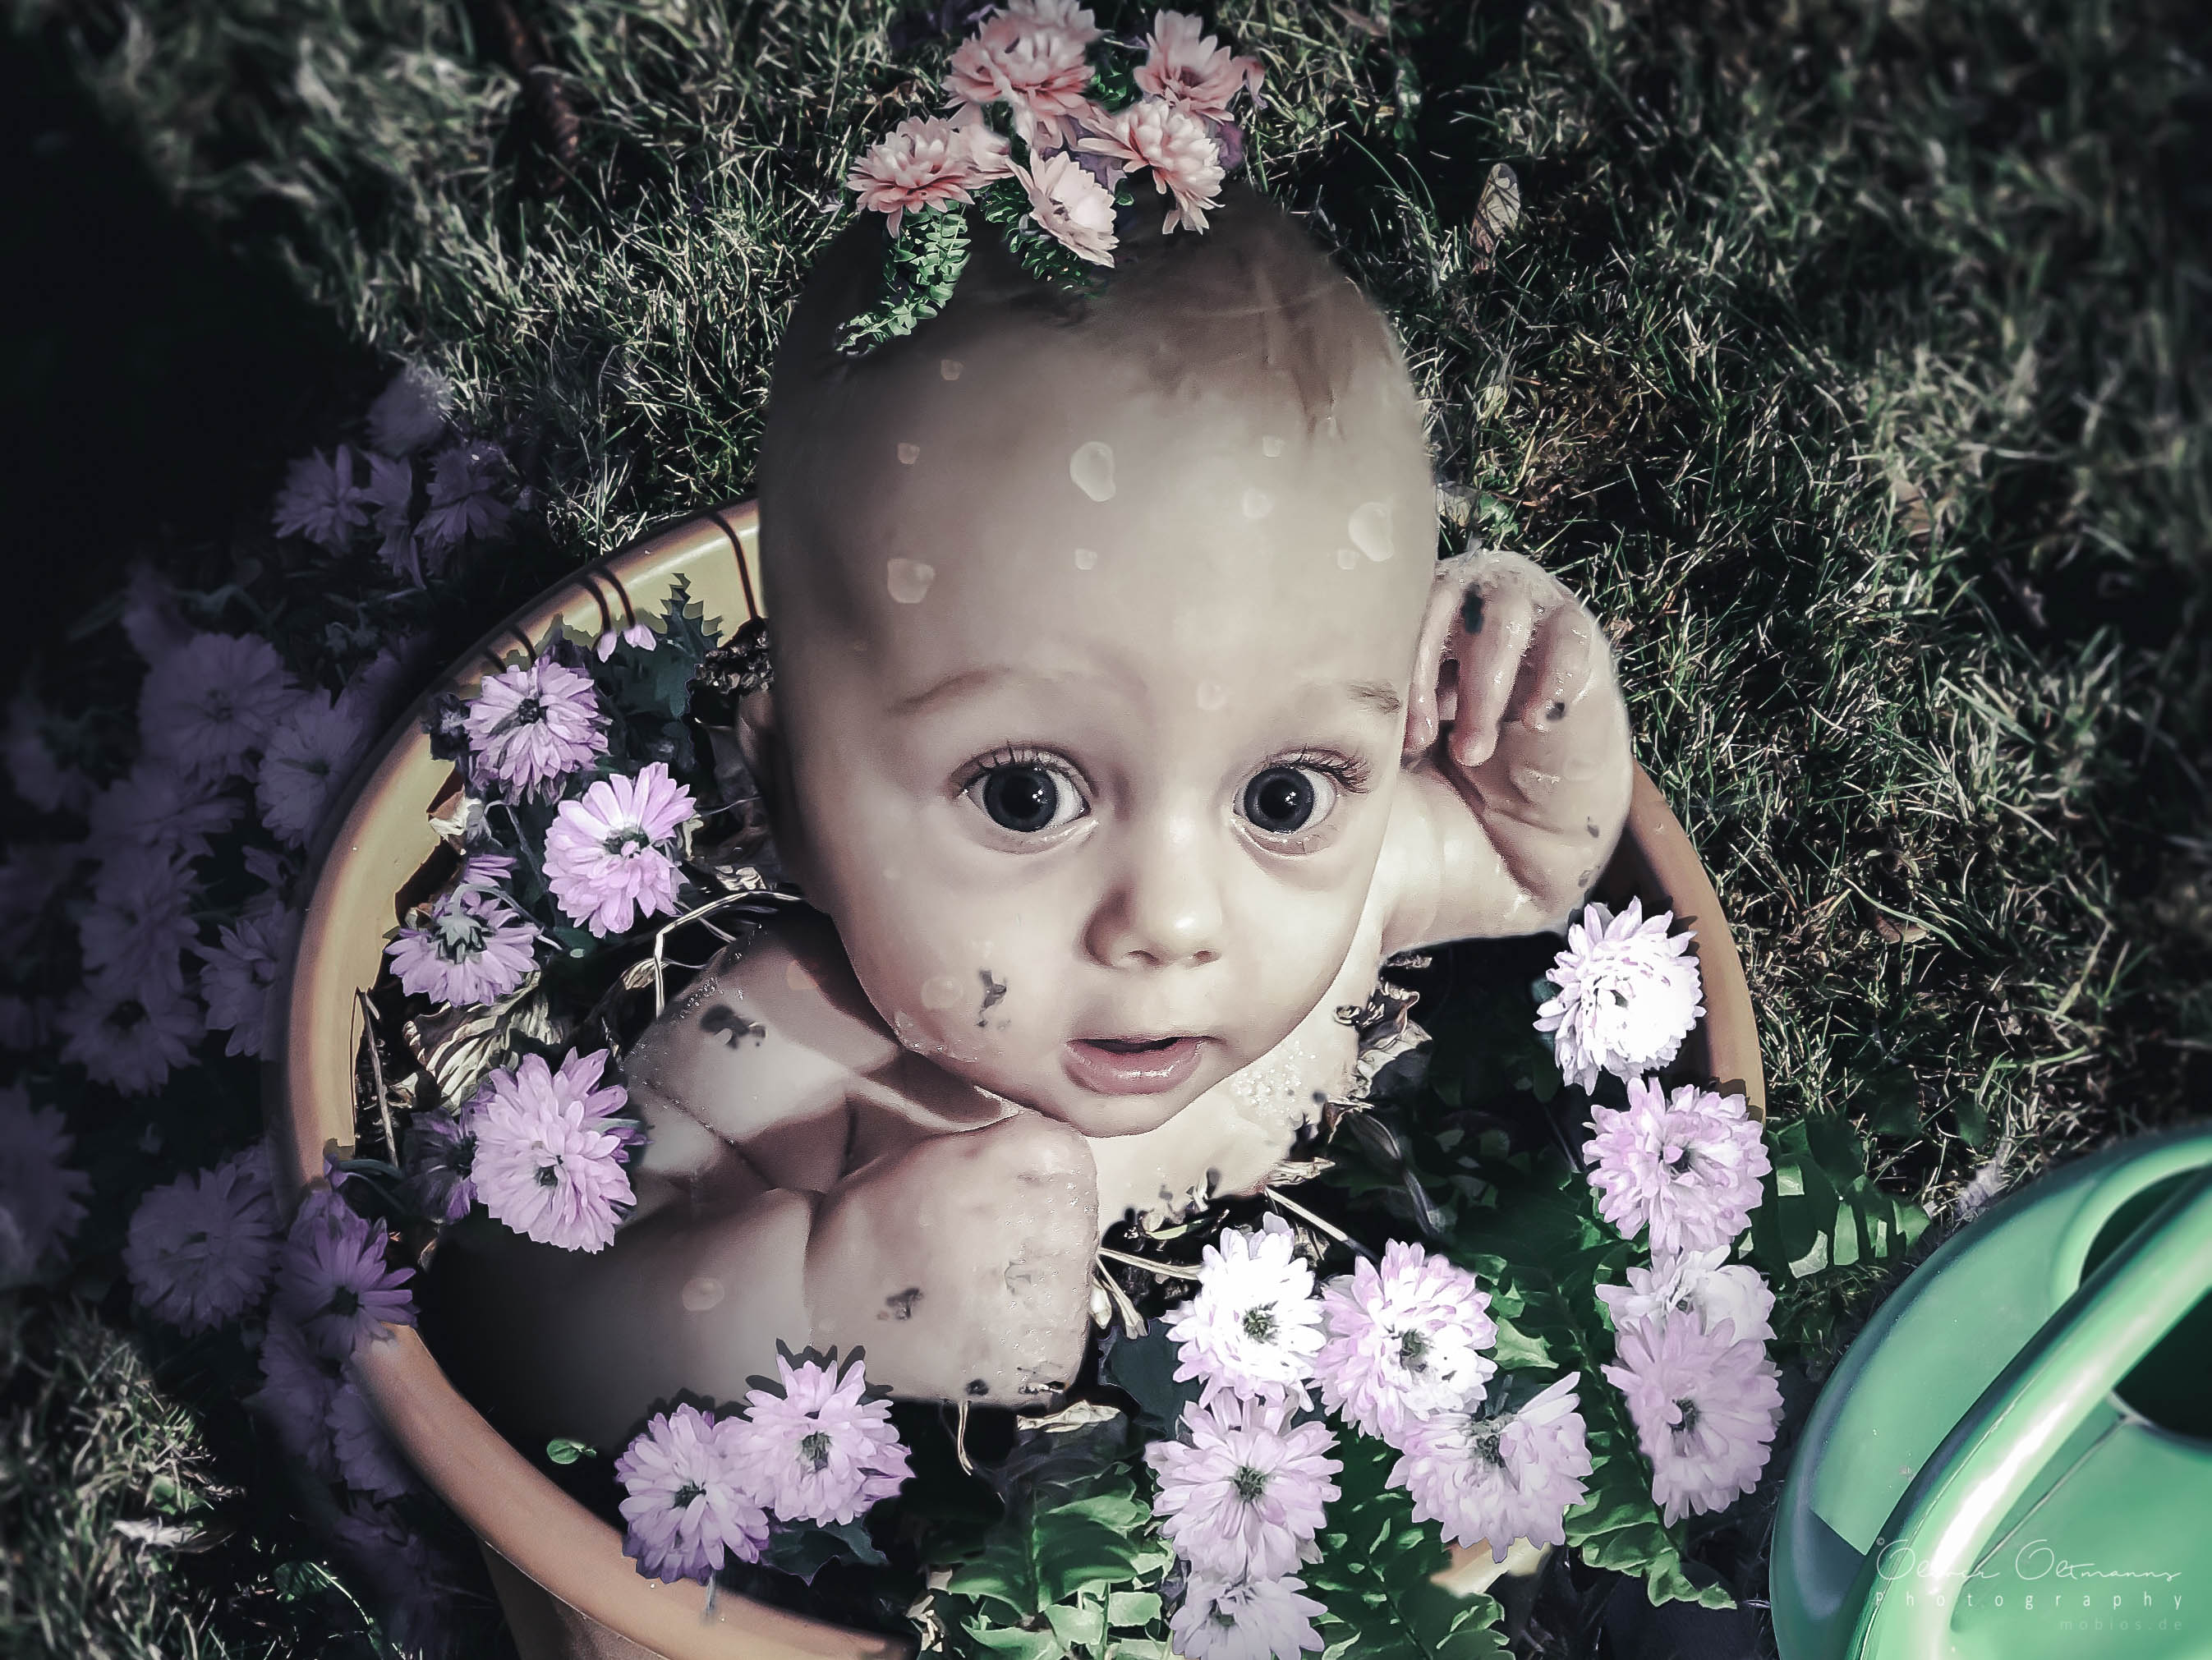 Baby im Blumentopf